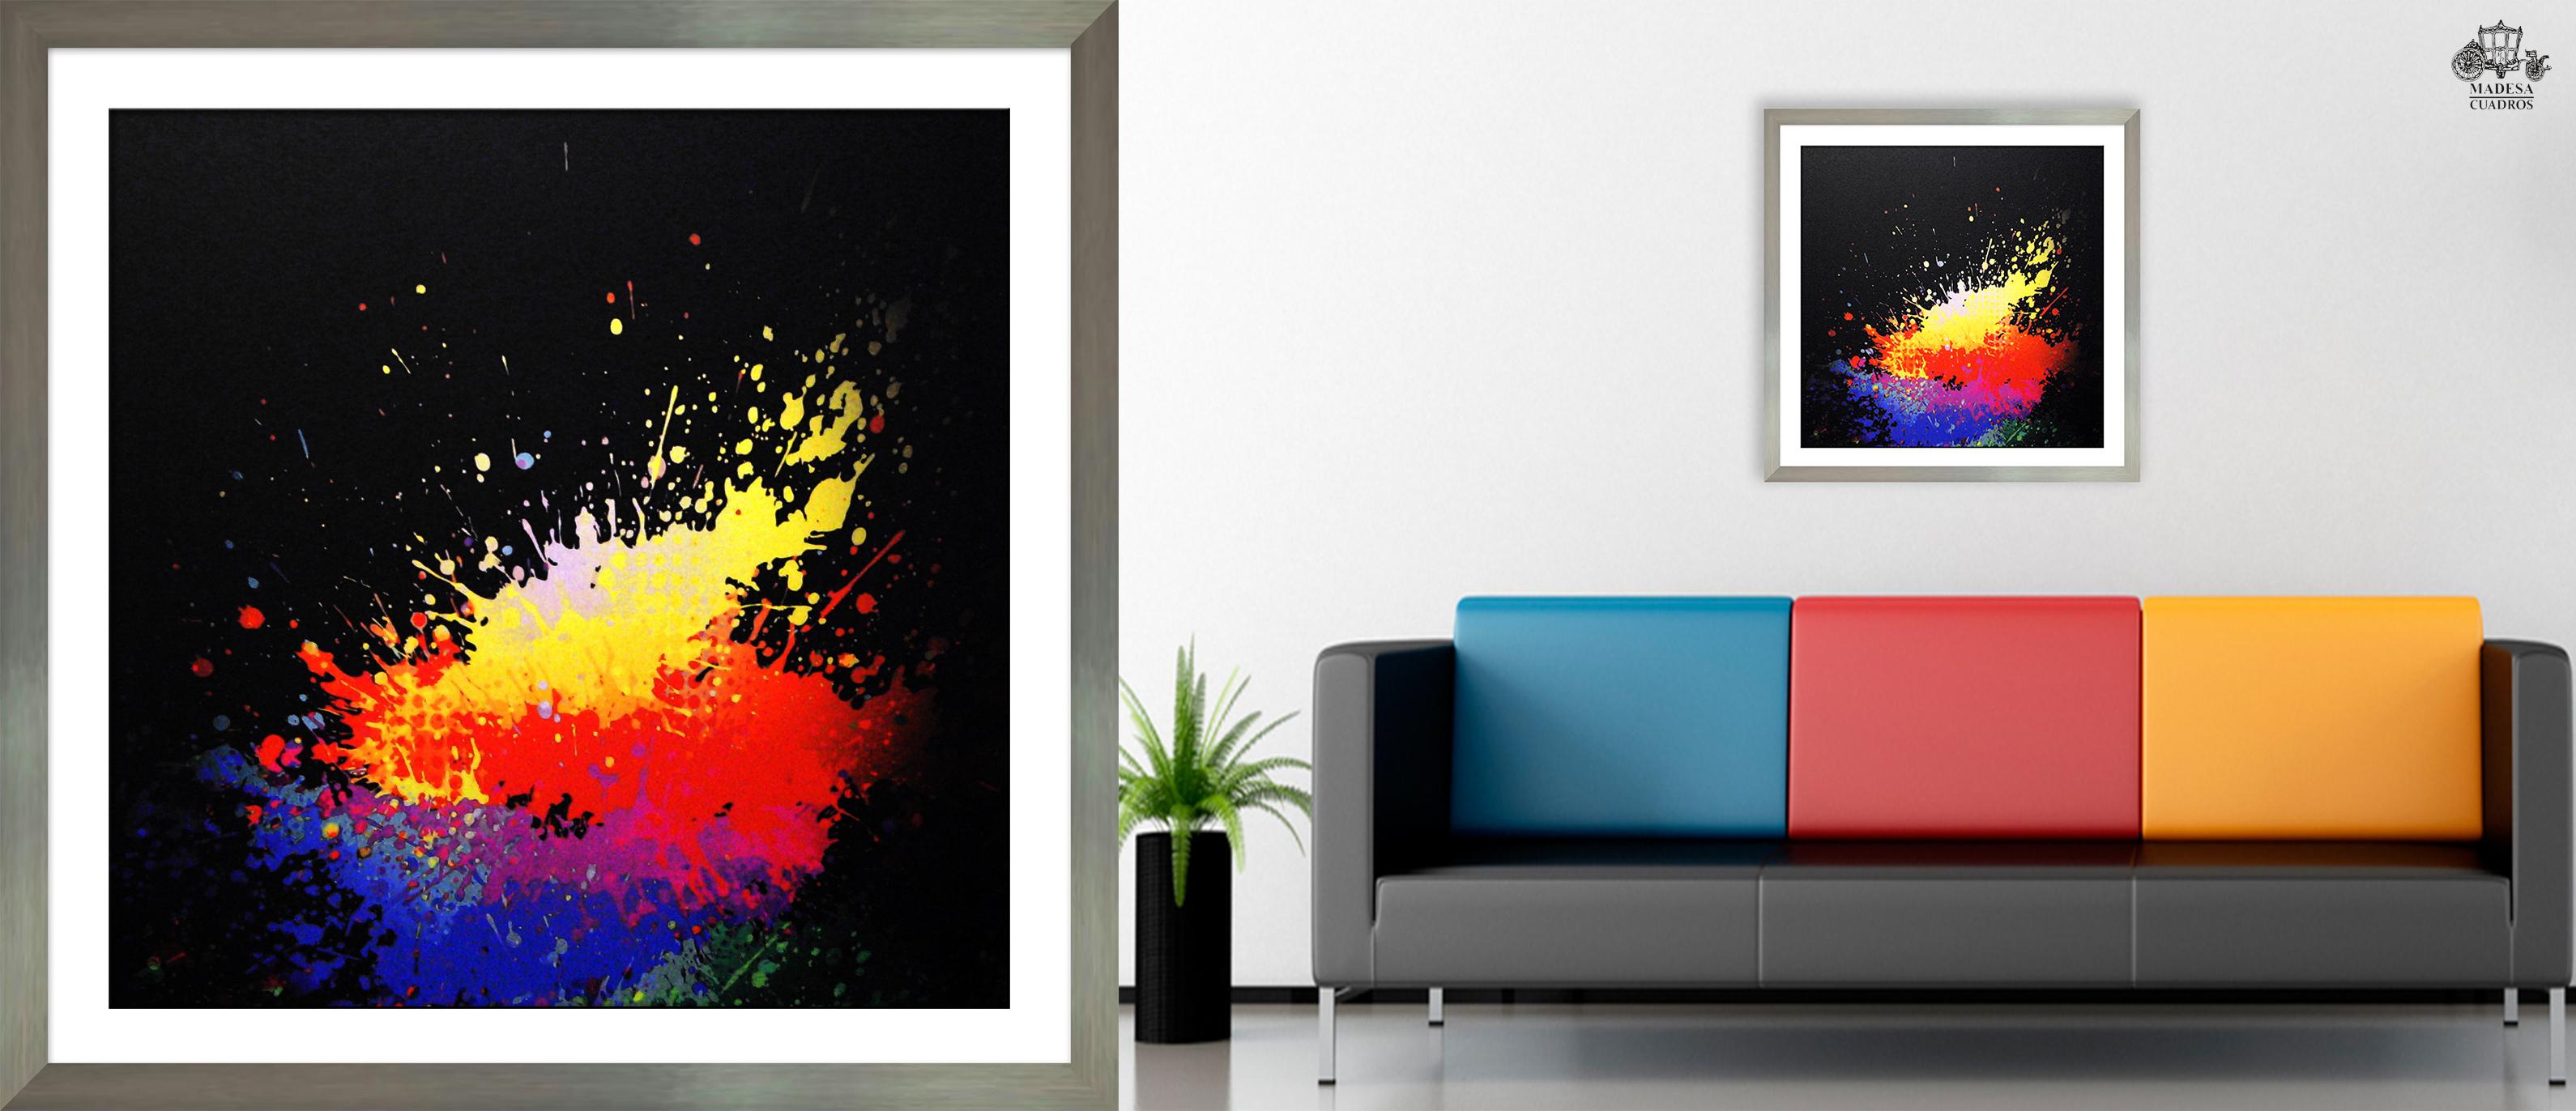 Colores II